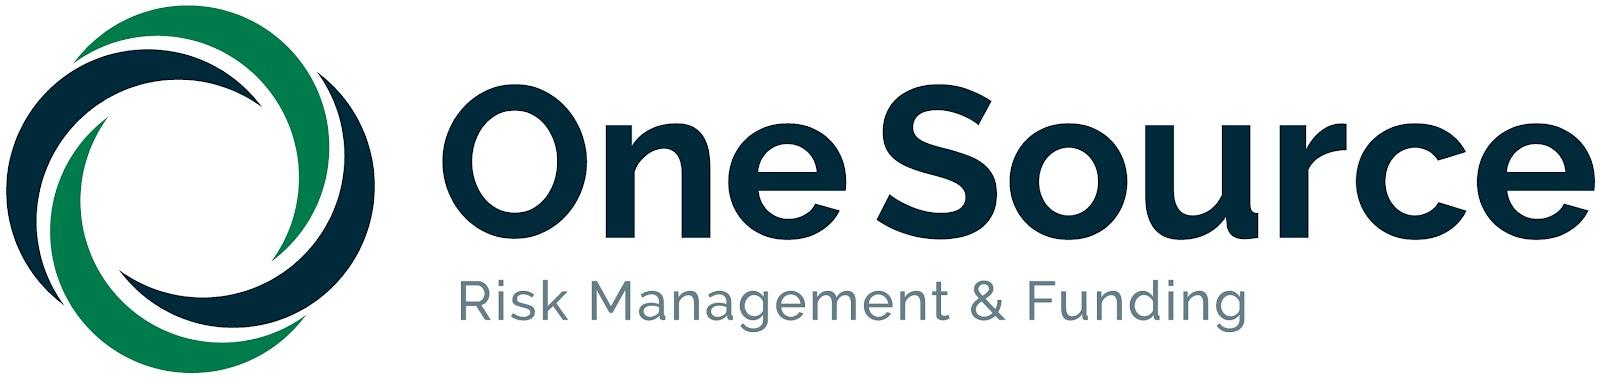 OneSource_Logo_Horz_RGB.jpg